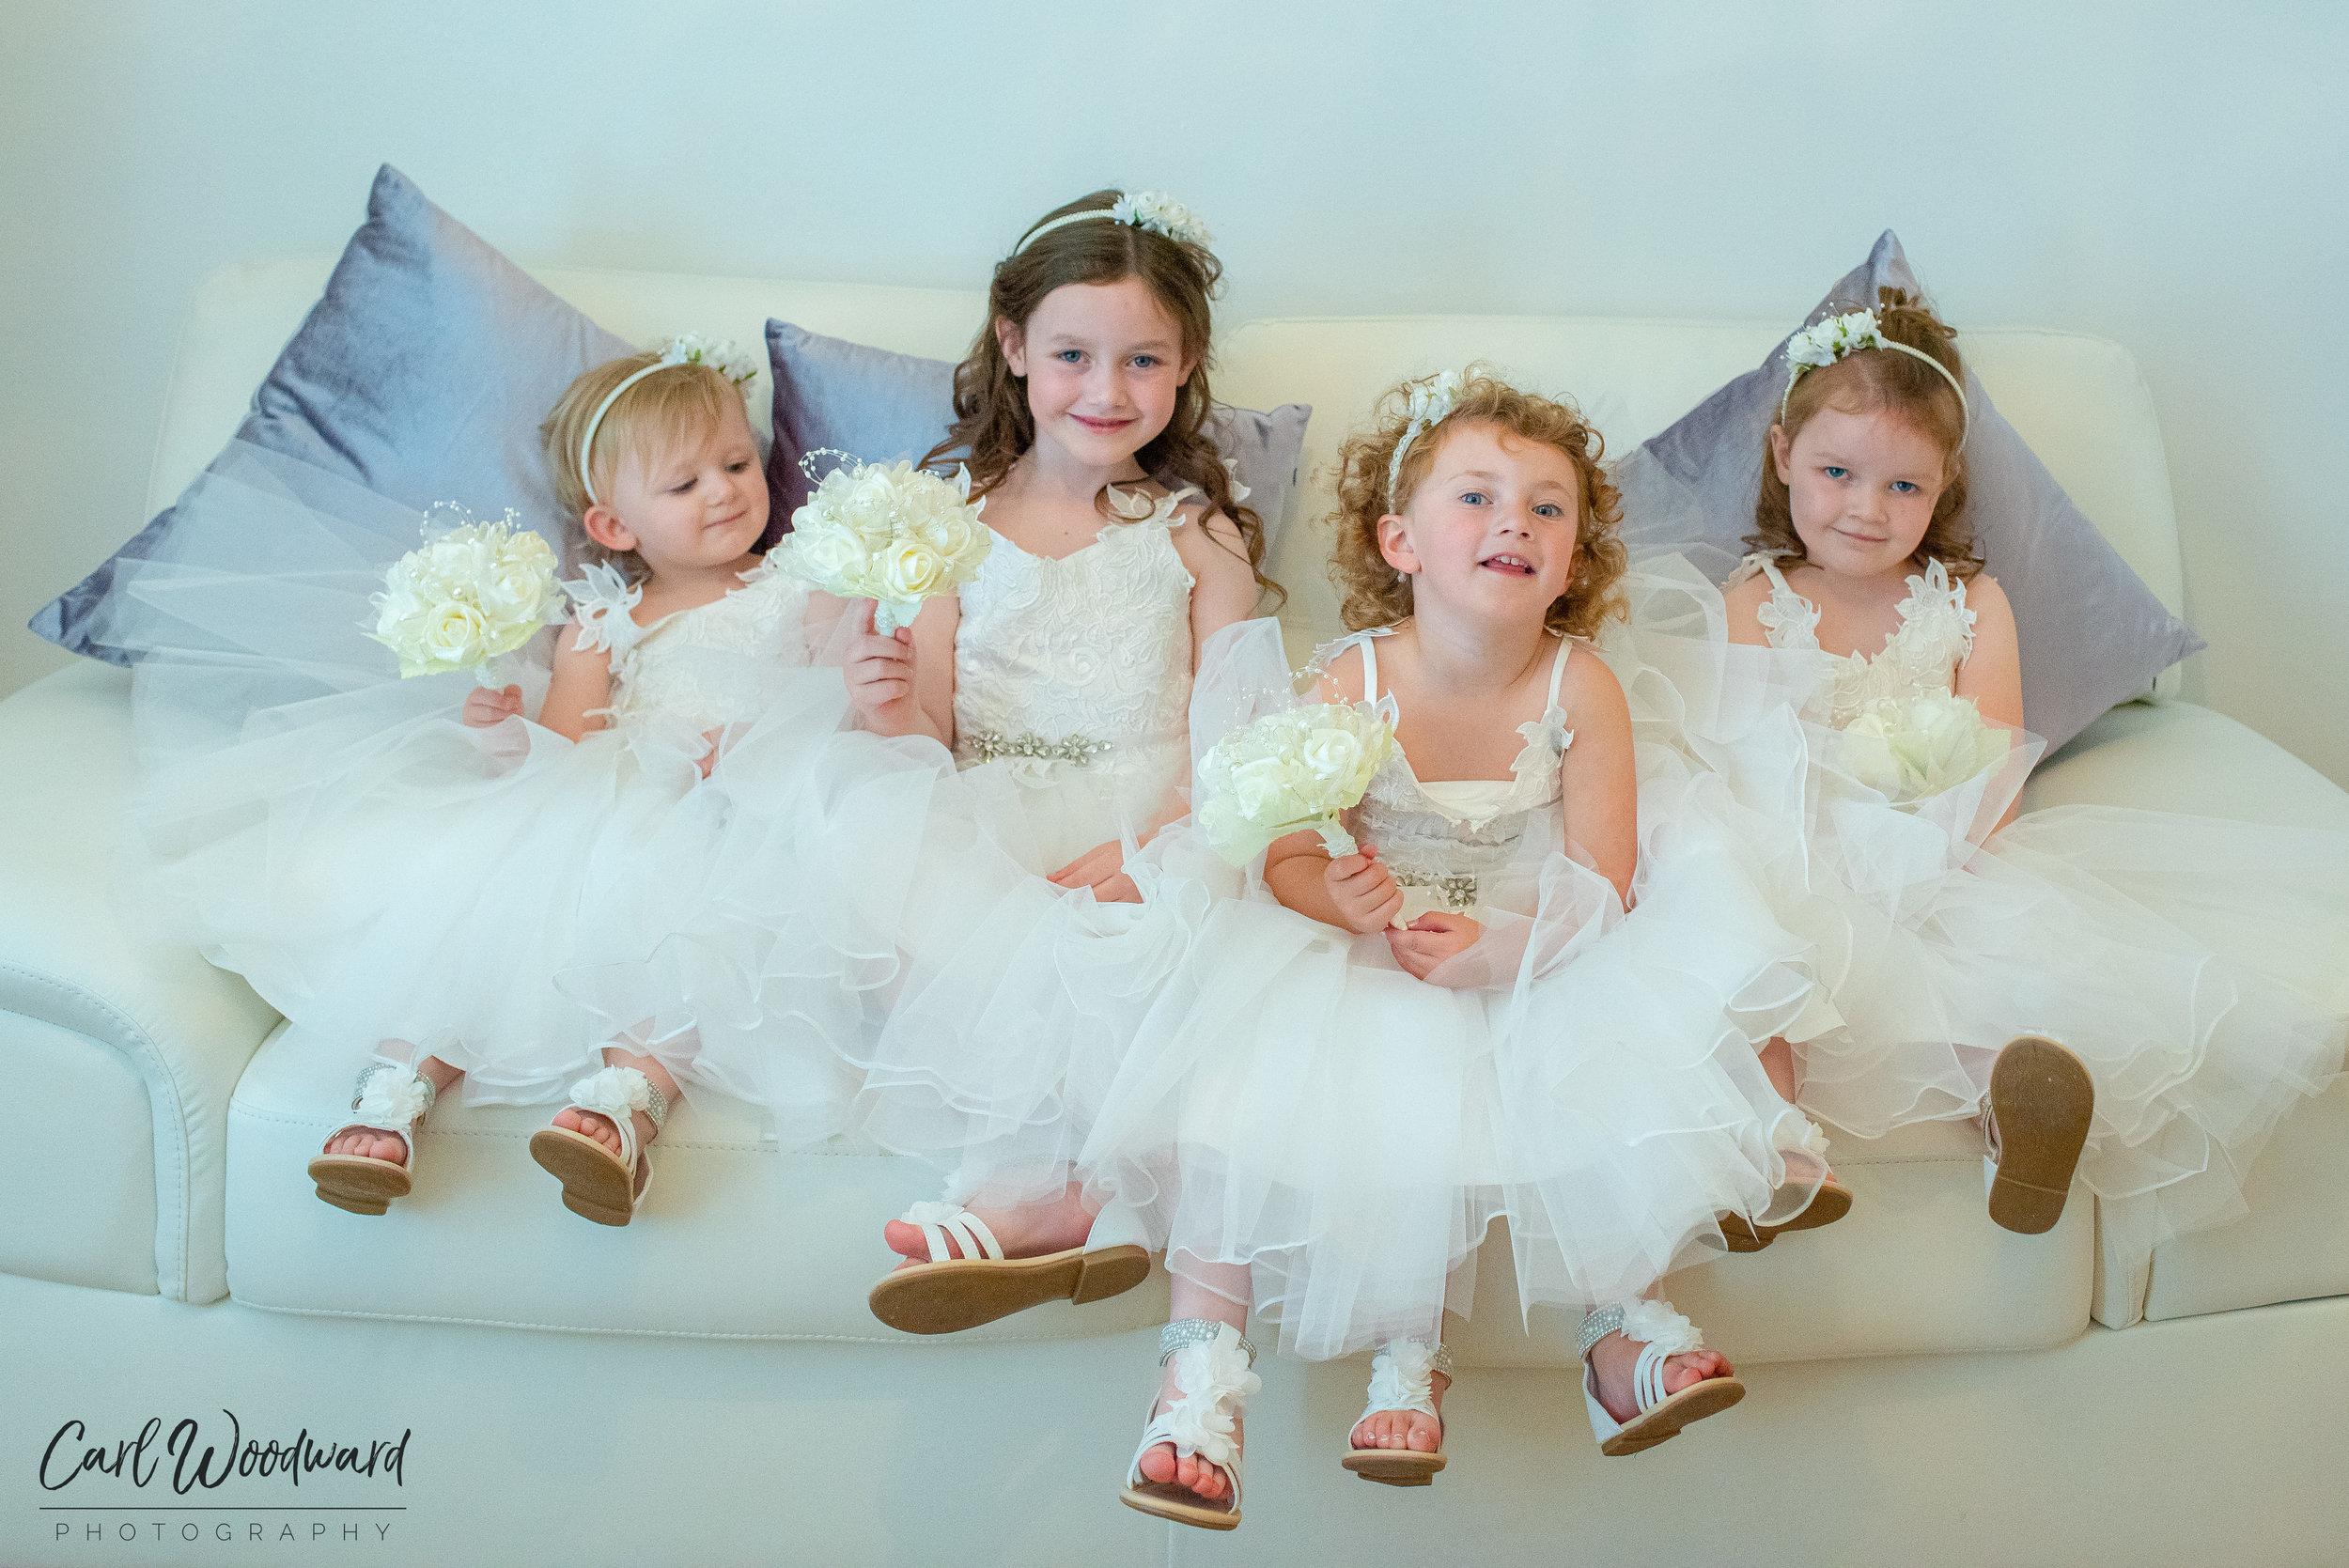 006-Mountain-Ash-Golf-Club-Wedding-Photography-Cardiff-Wedding-Photographer.jpg